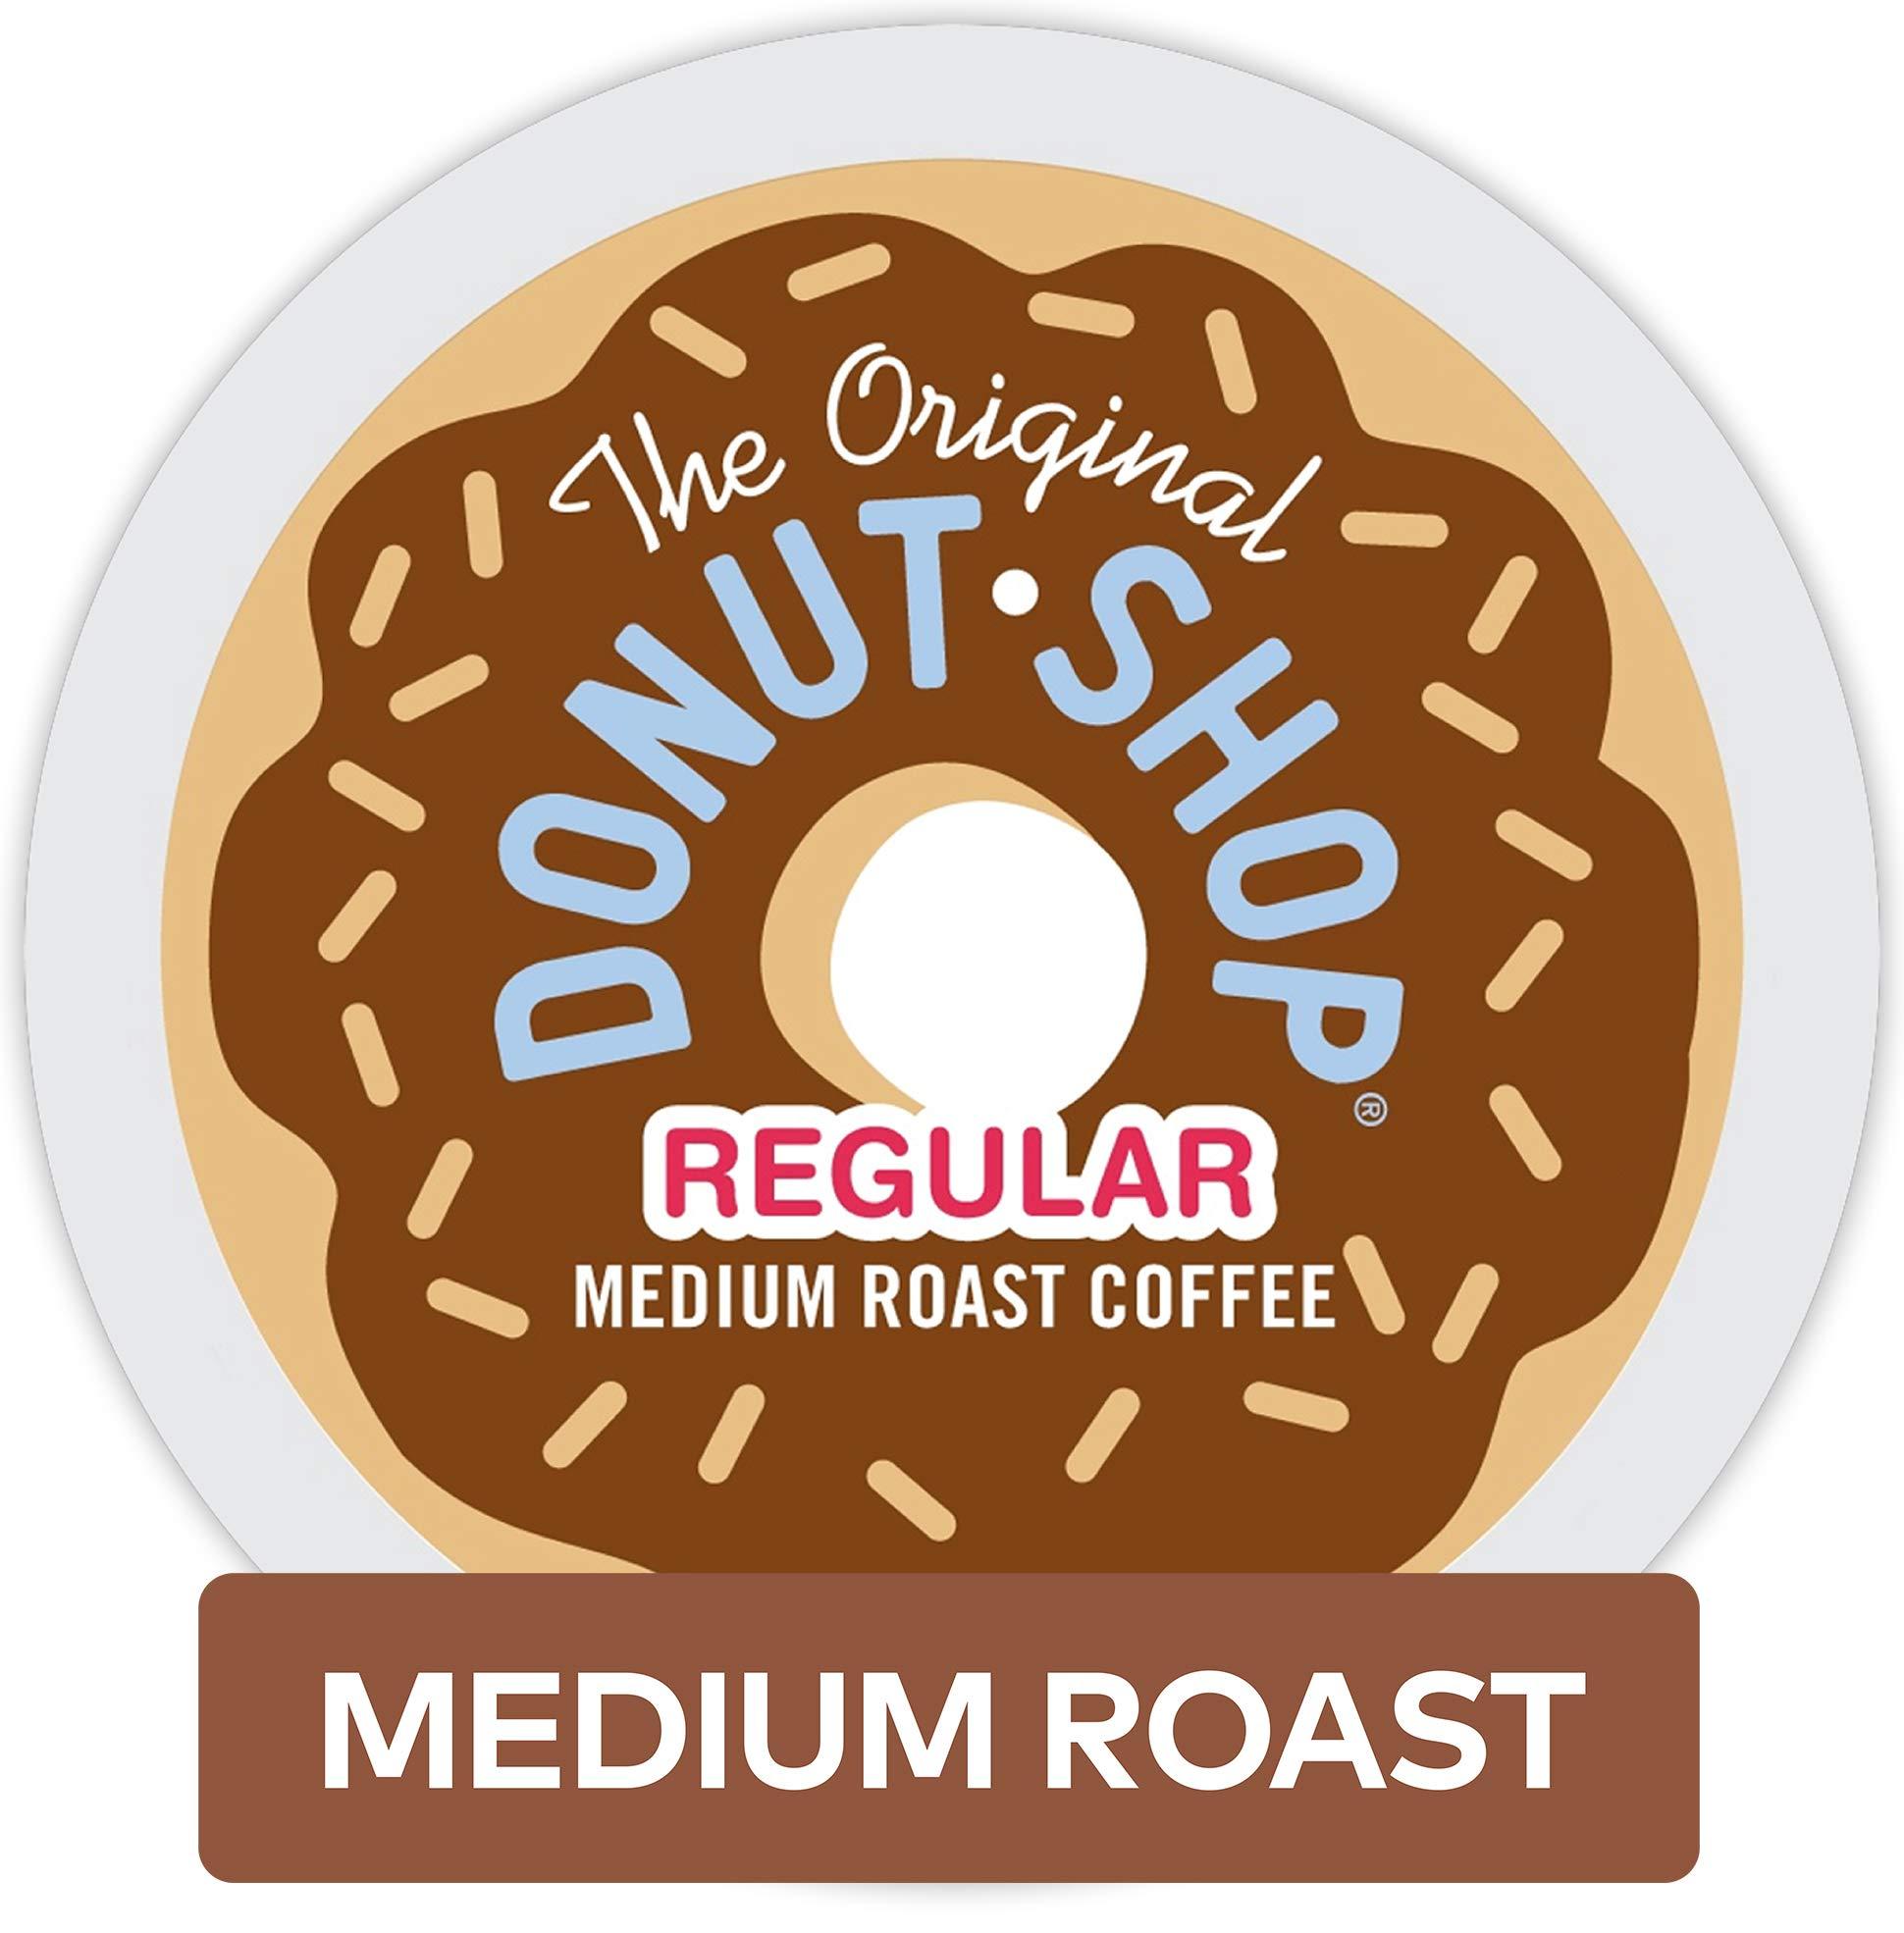 The Original Donut Shop Coffee, Regular Medium Roast, K-Cup Portion Count for Keurig Brewers, 24 Count, Pack of 4 by The Original Donut Shop